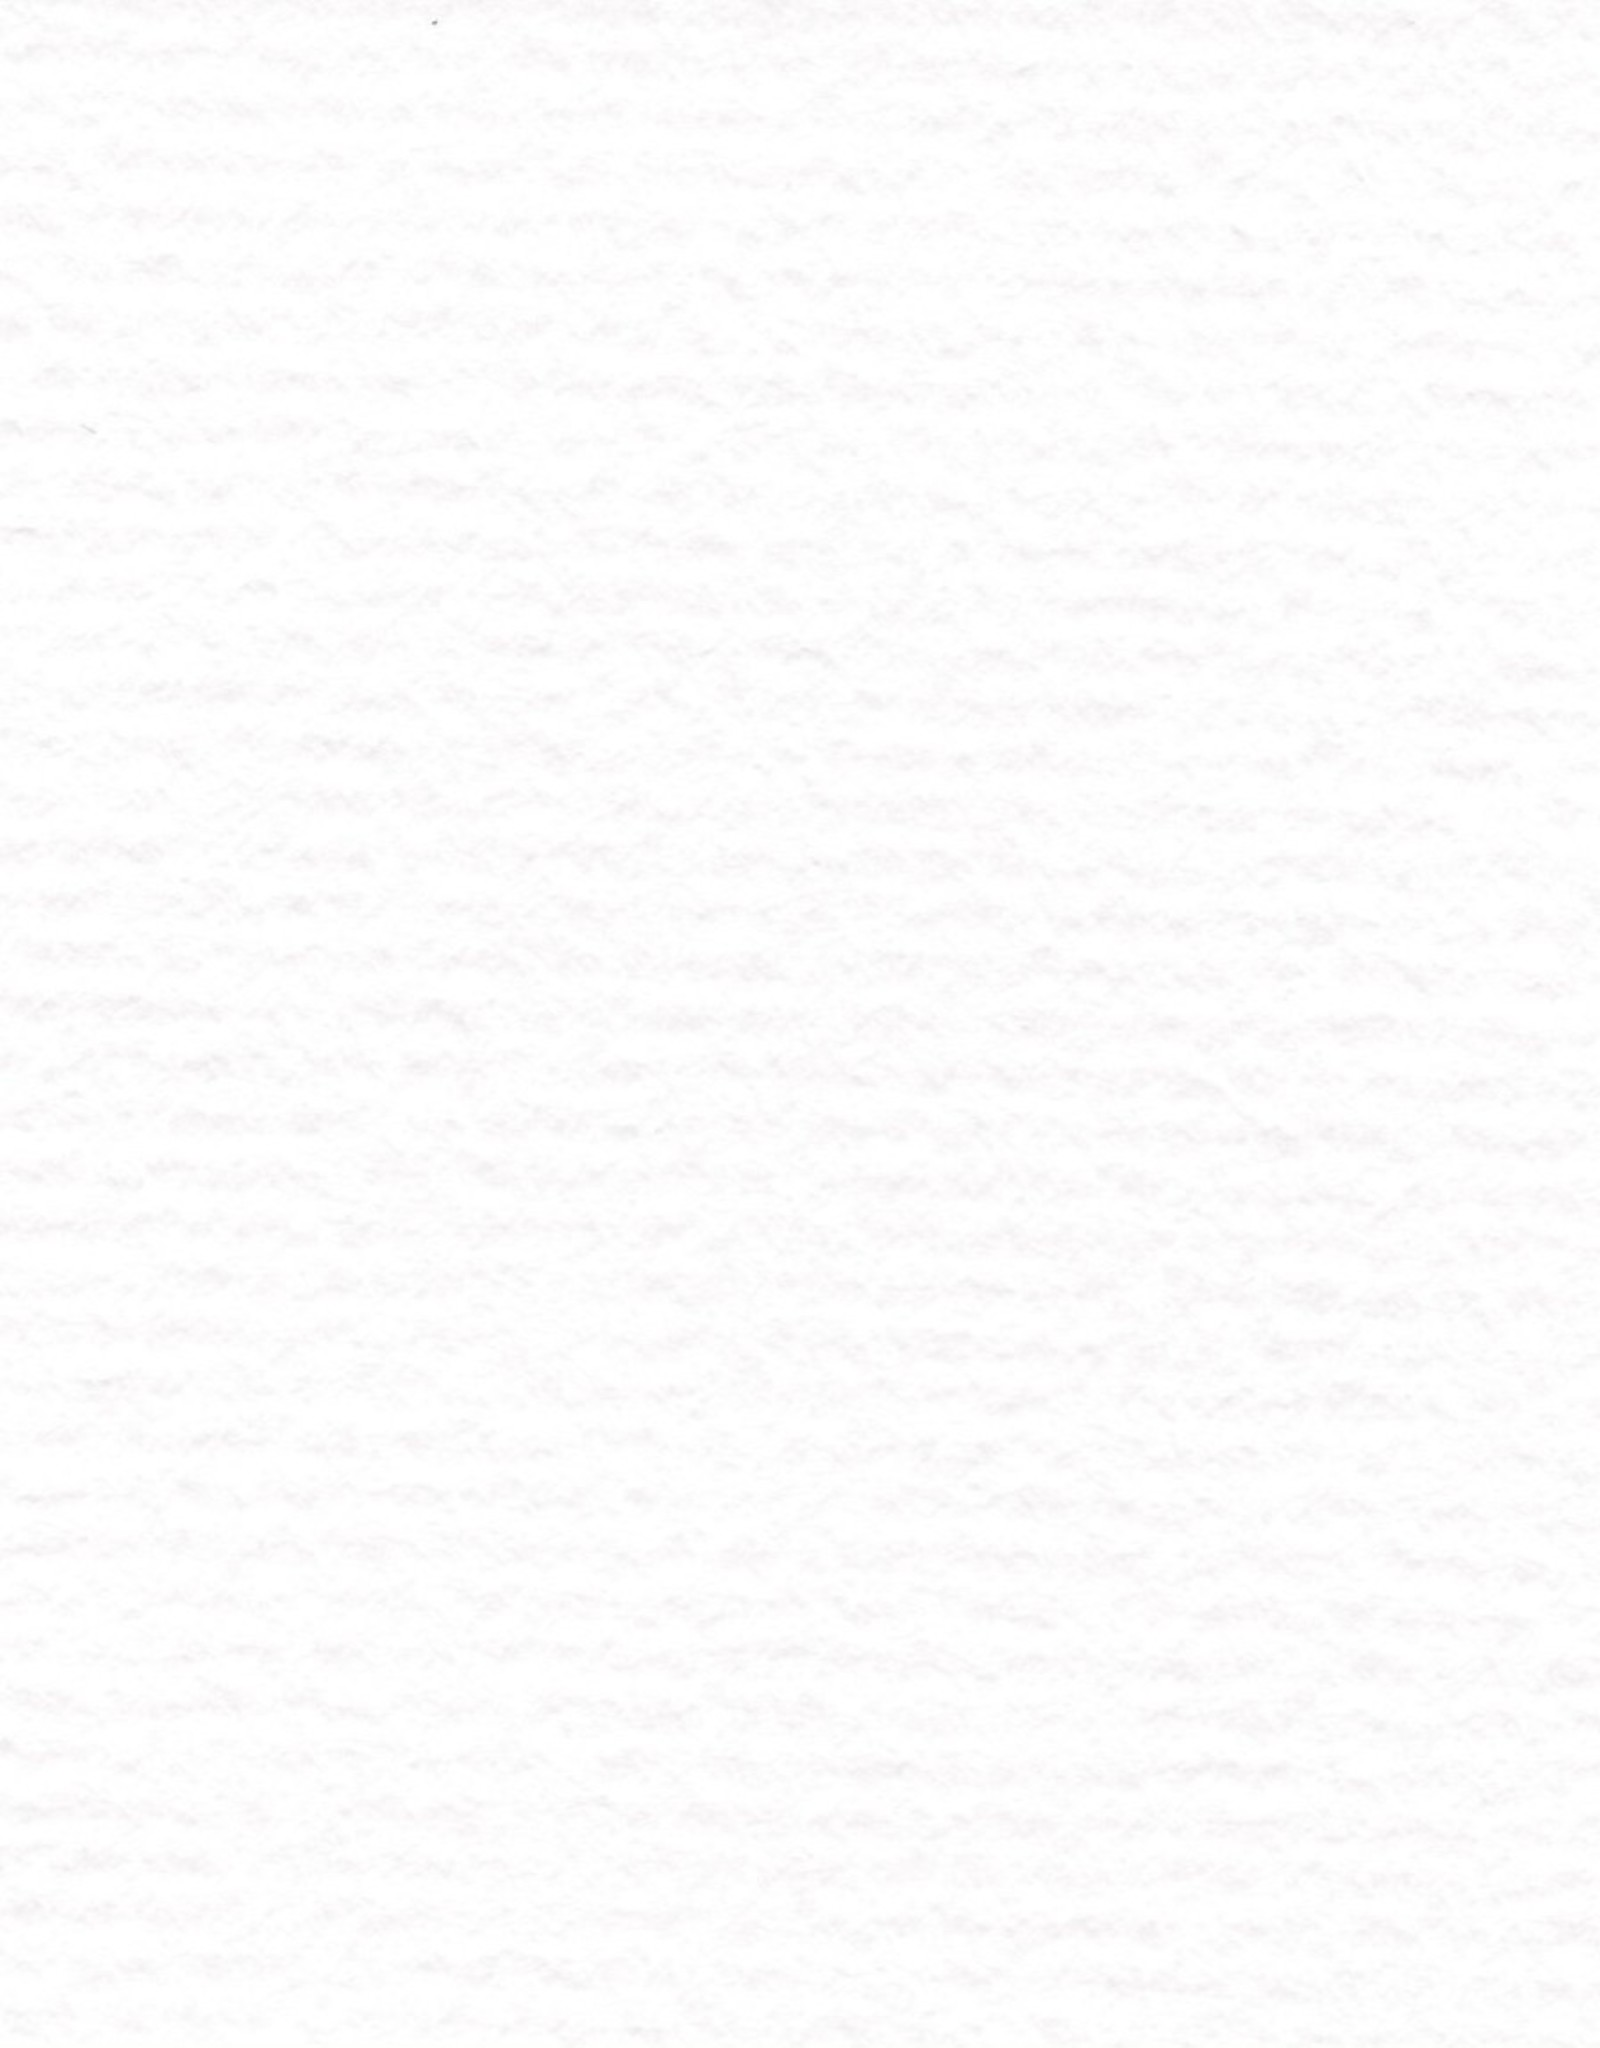 "Hahnemuhle Bugra, White #309, 33"" x 41"" 130 gsm"